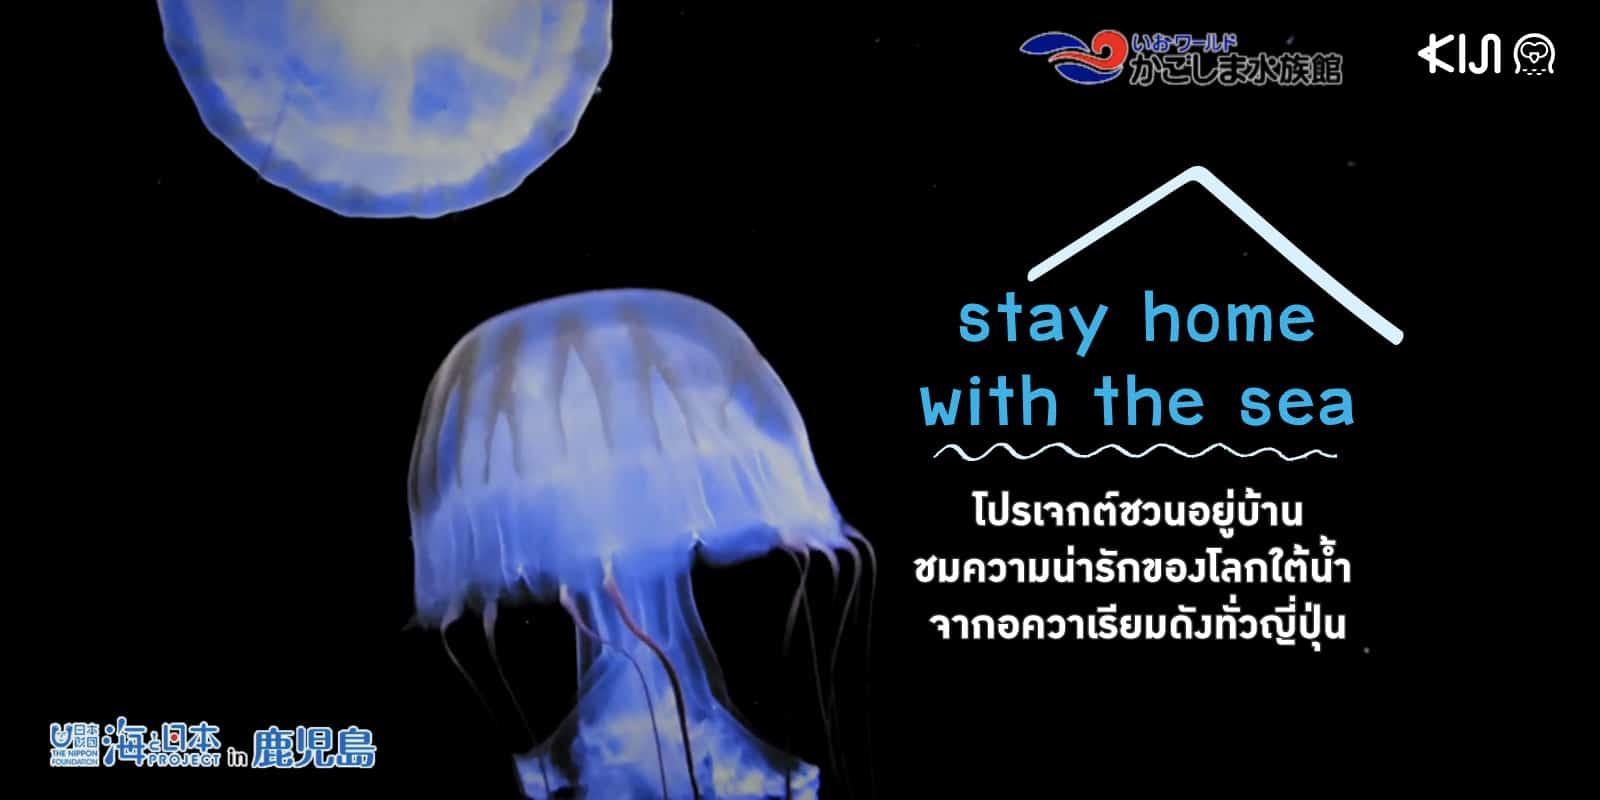 'stay home with the sea' โปรเจกต์ชวนอยู่บ้านชมความน่ารักของโลกใต้น้ำ ผ่านไลฟ์และวิดีโอจากอควาเรียมดังทั่วญี่ปุ่น